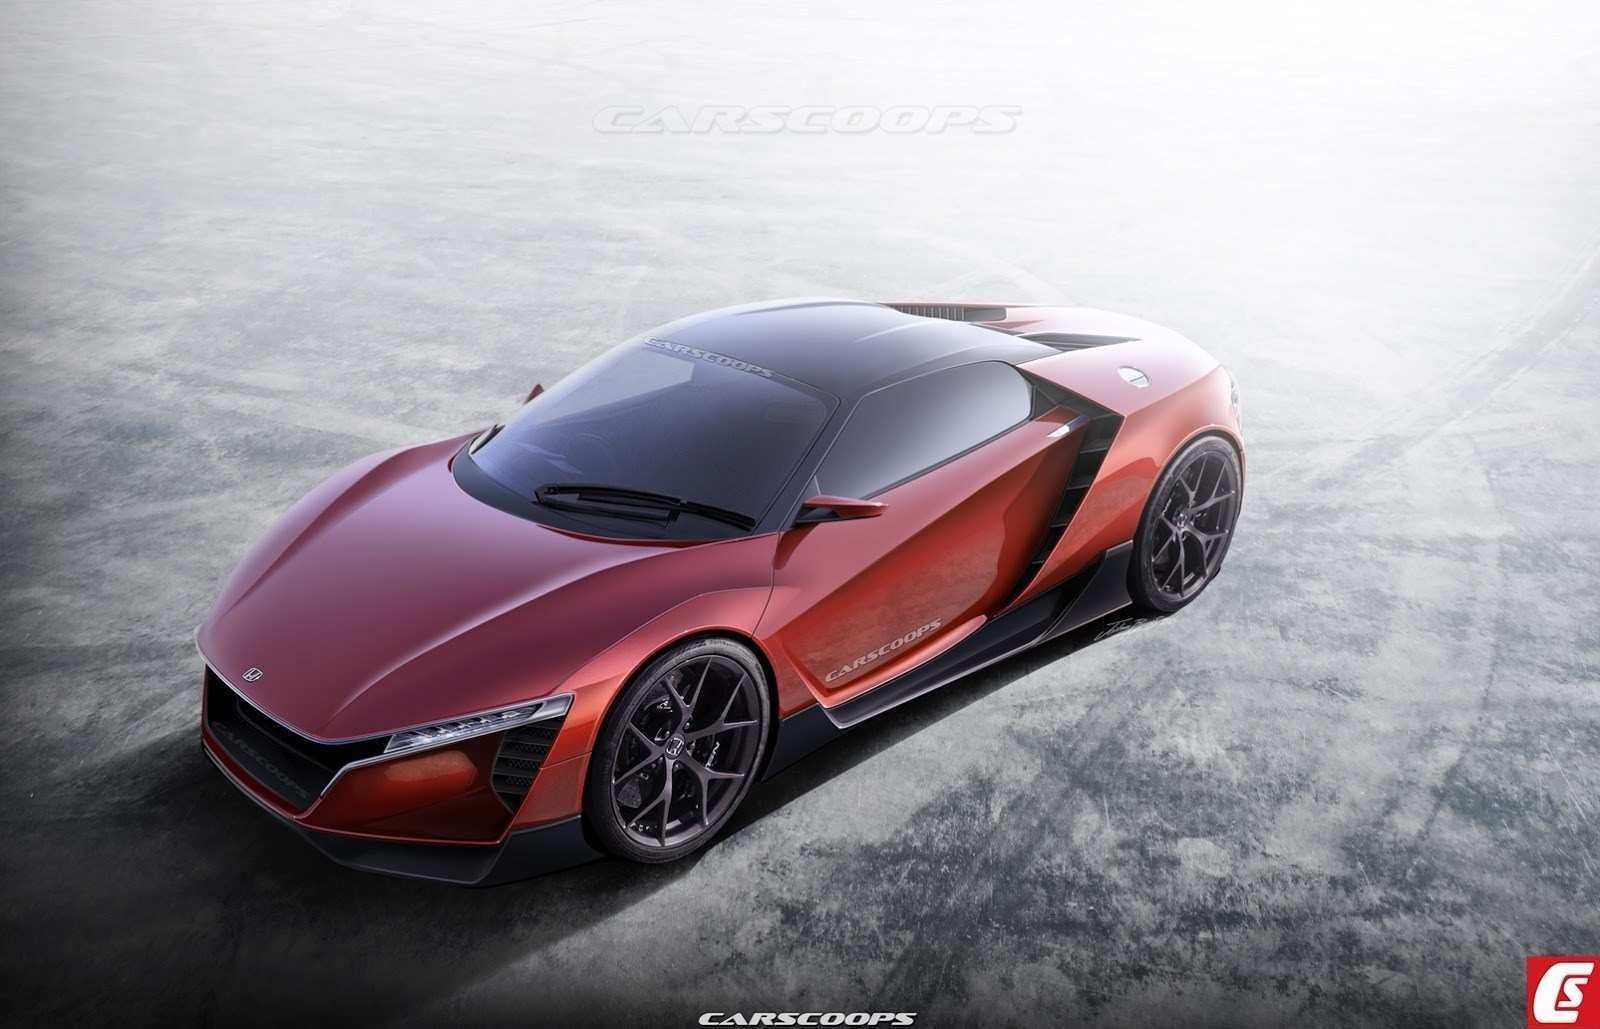 2020 Honda S2000 Concept, 2020 Arabalar